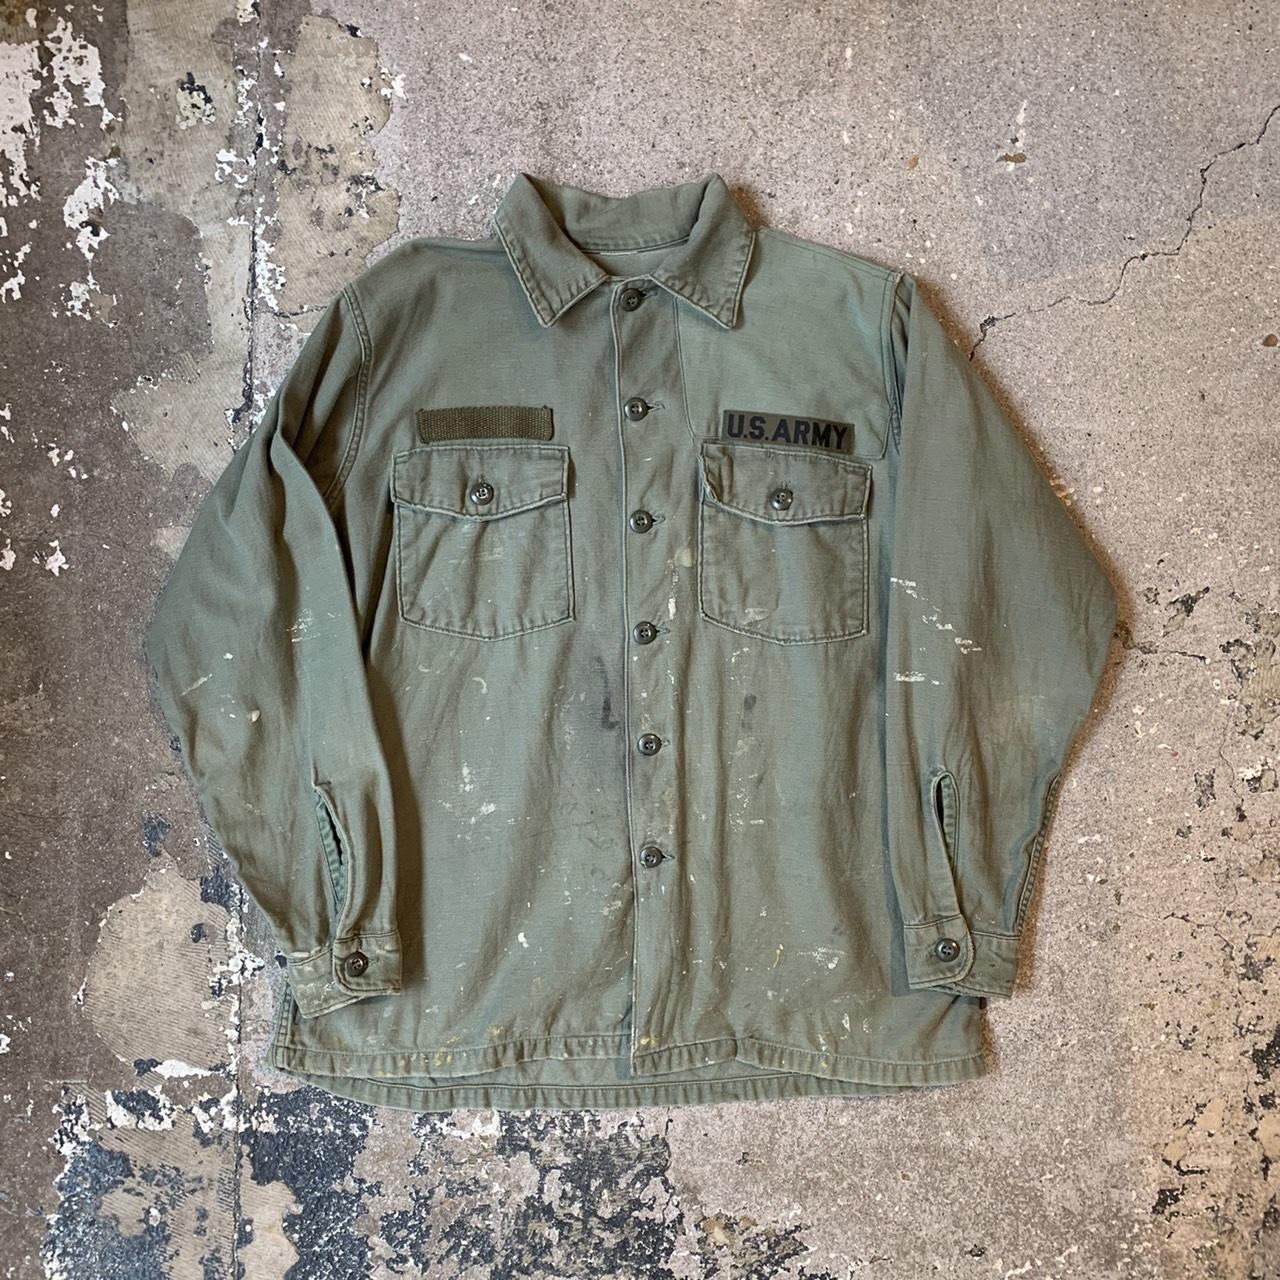 70's US ARMY Utility shirt